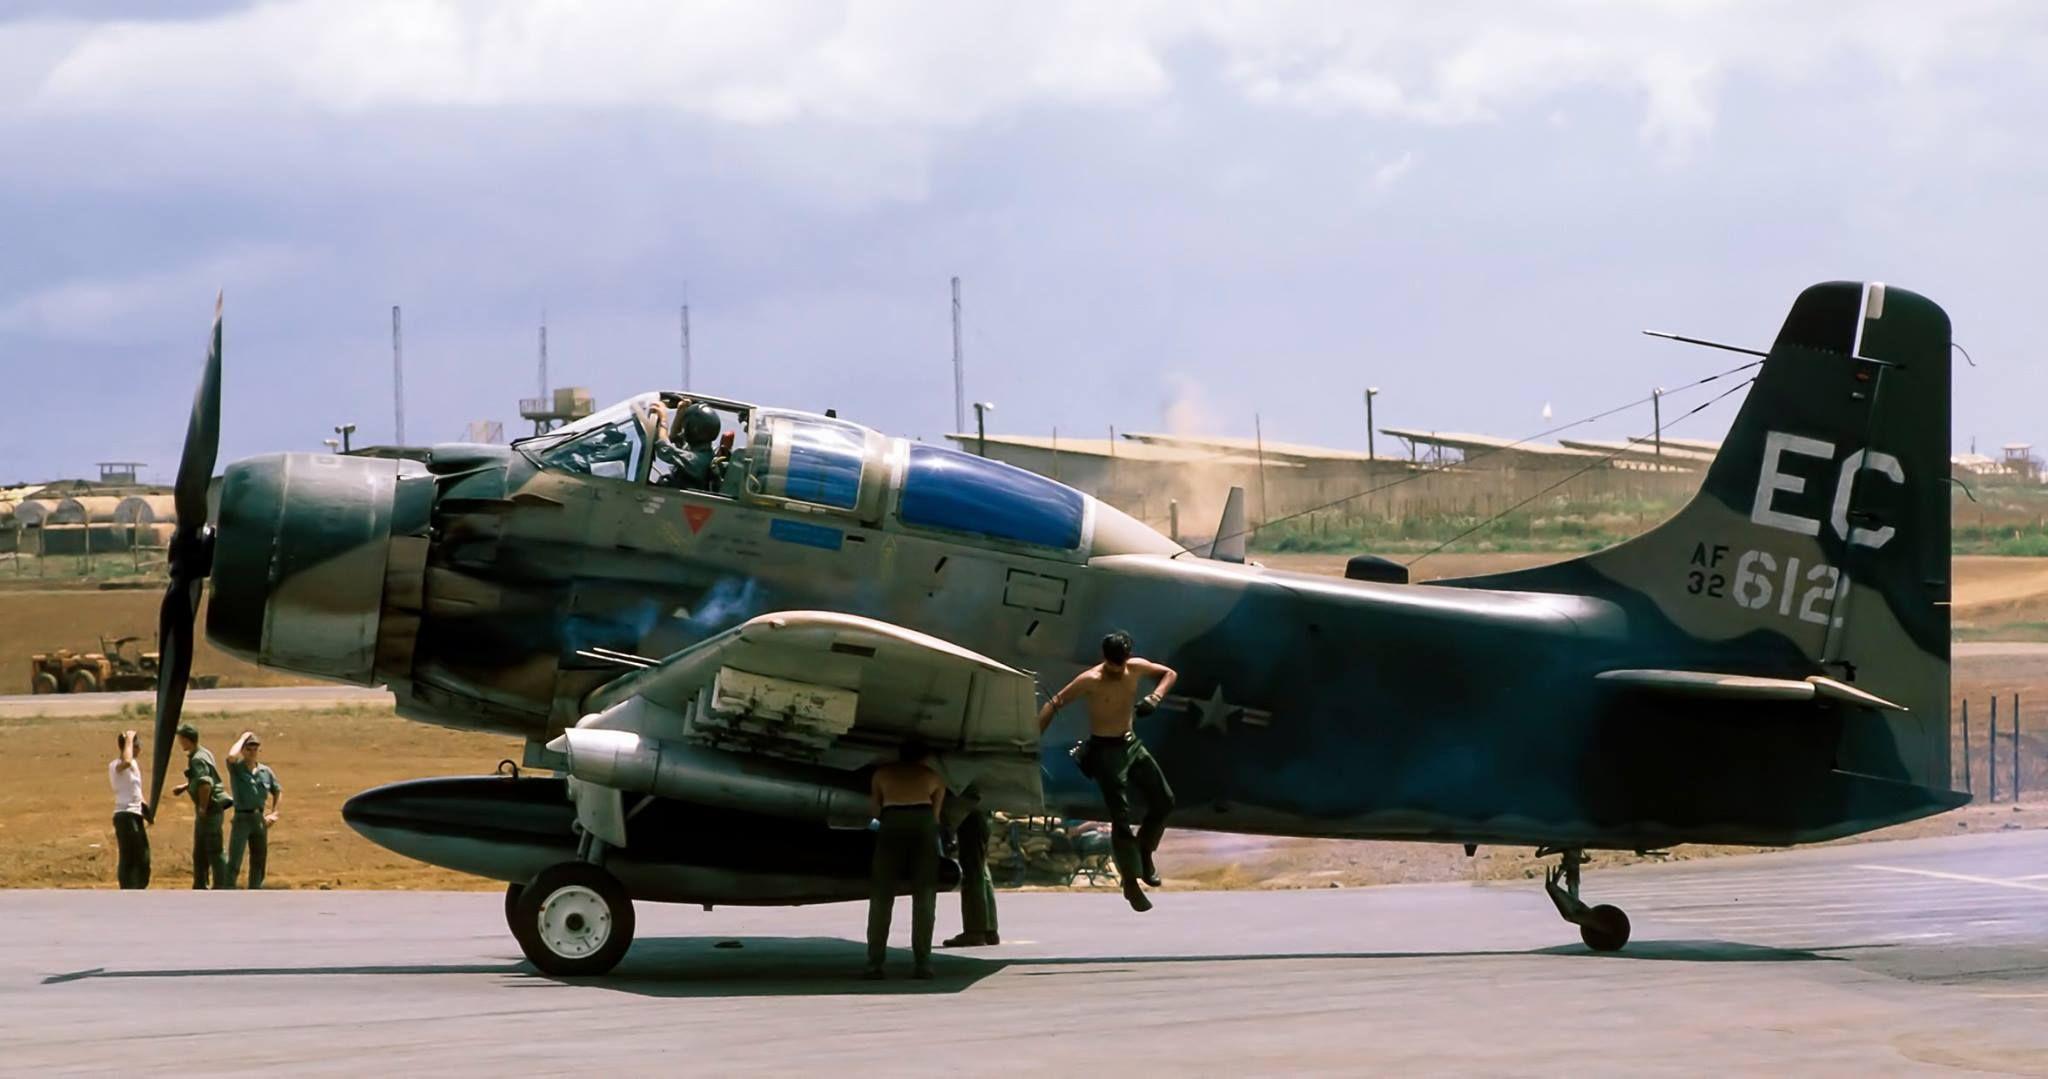 Douglas A-1 Skyraider Pleiku 67-68